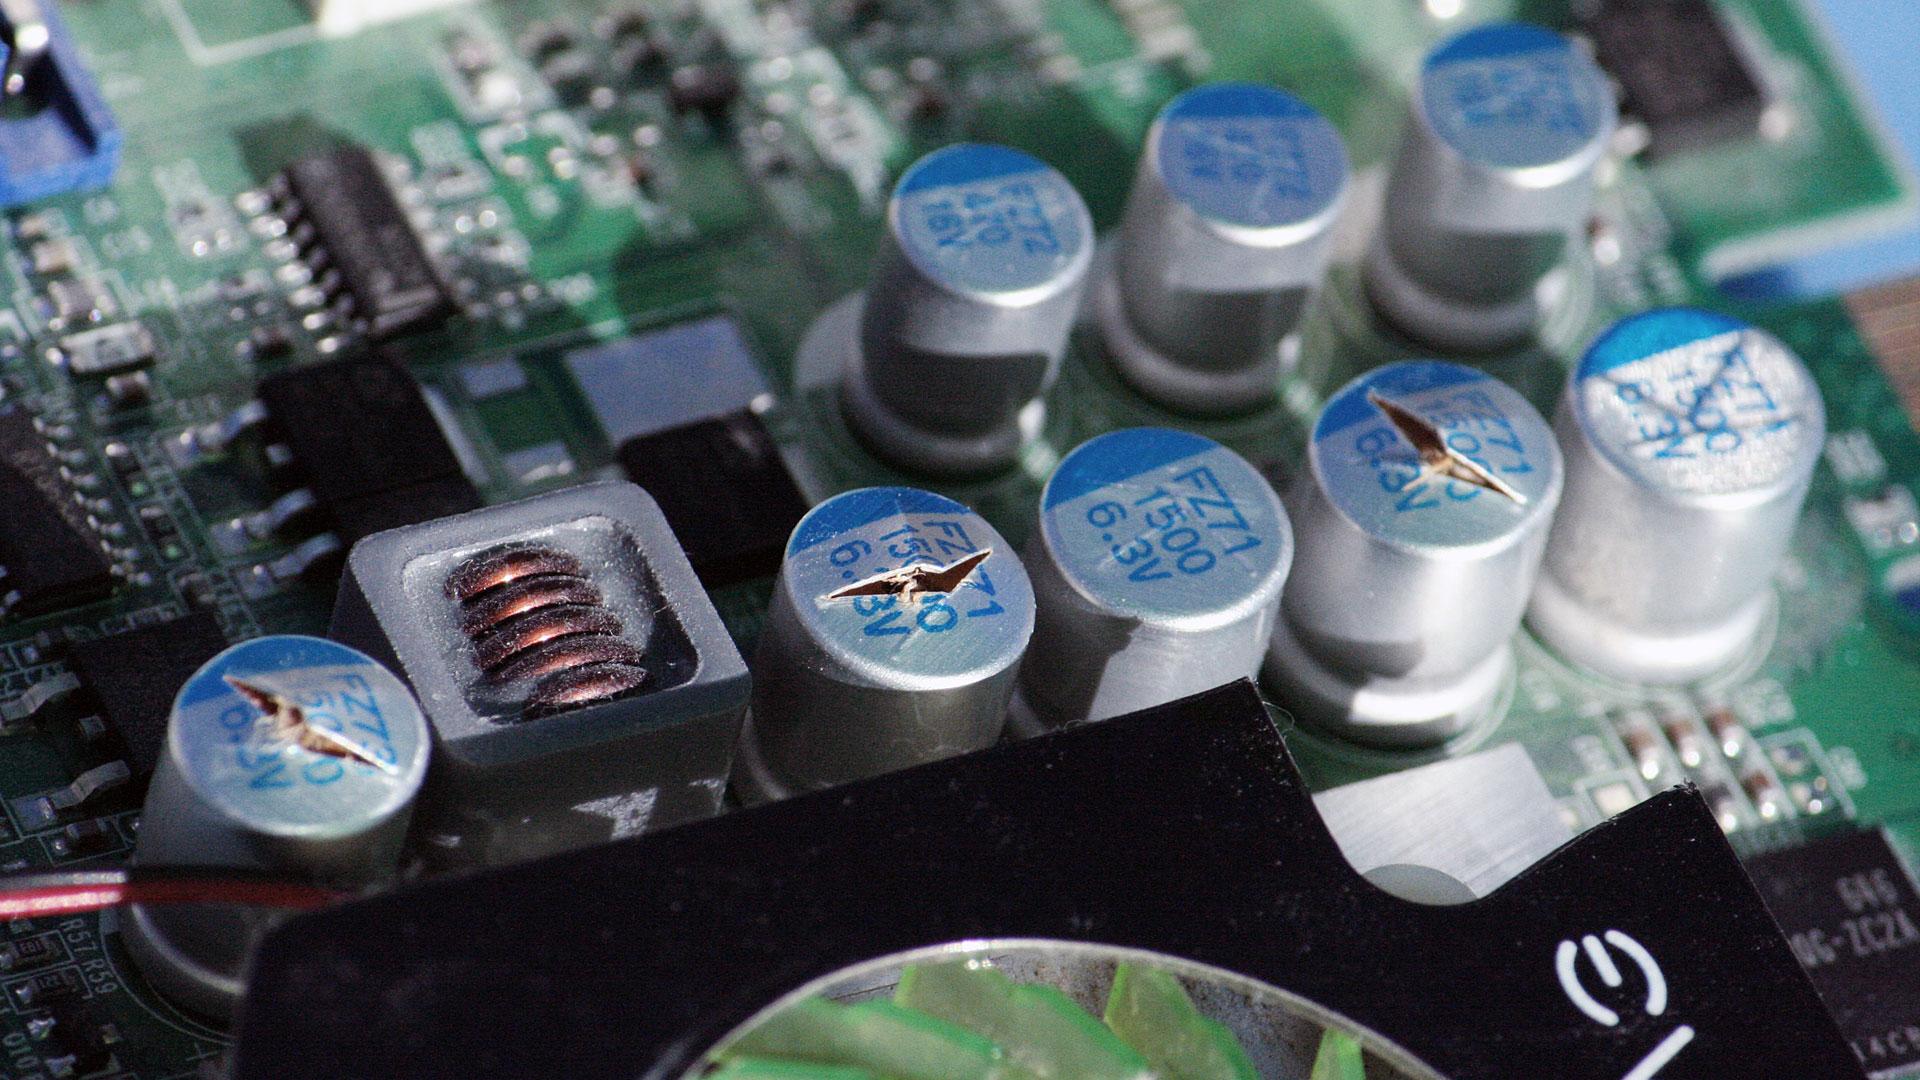 evga_nvidia_blown_capacitors_1080